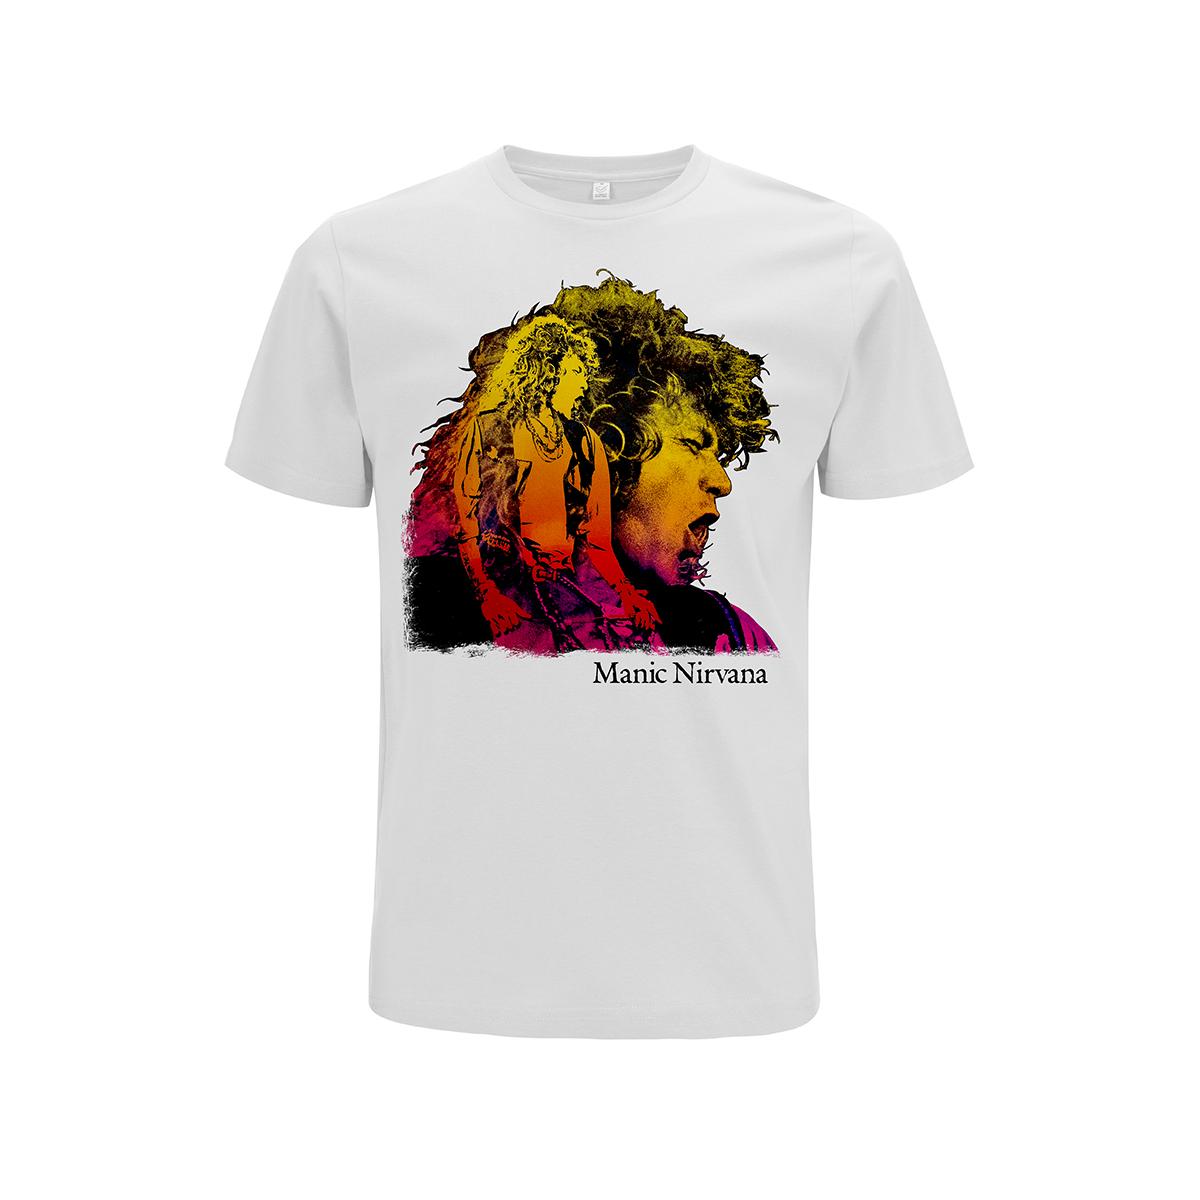 Manic Nirvana Tour – White Tee - Robert Plant